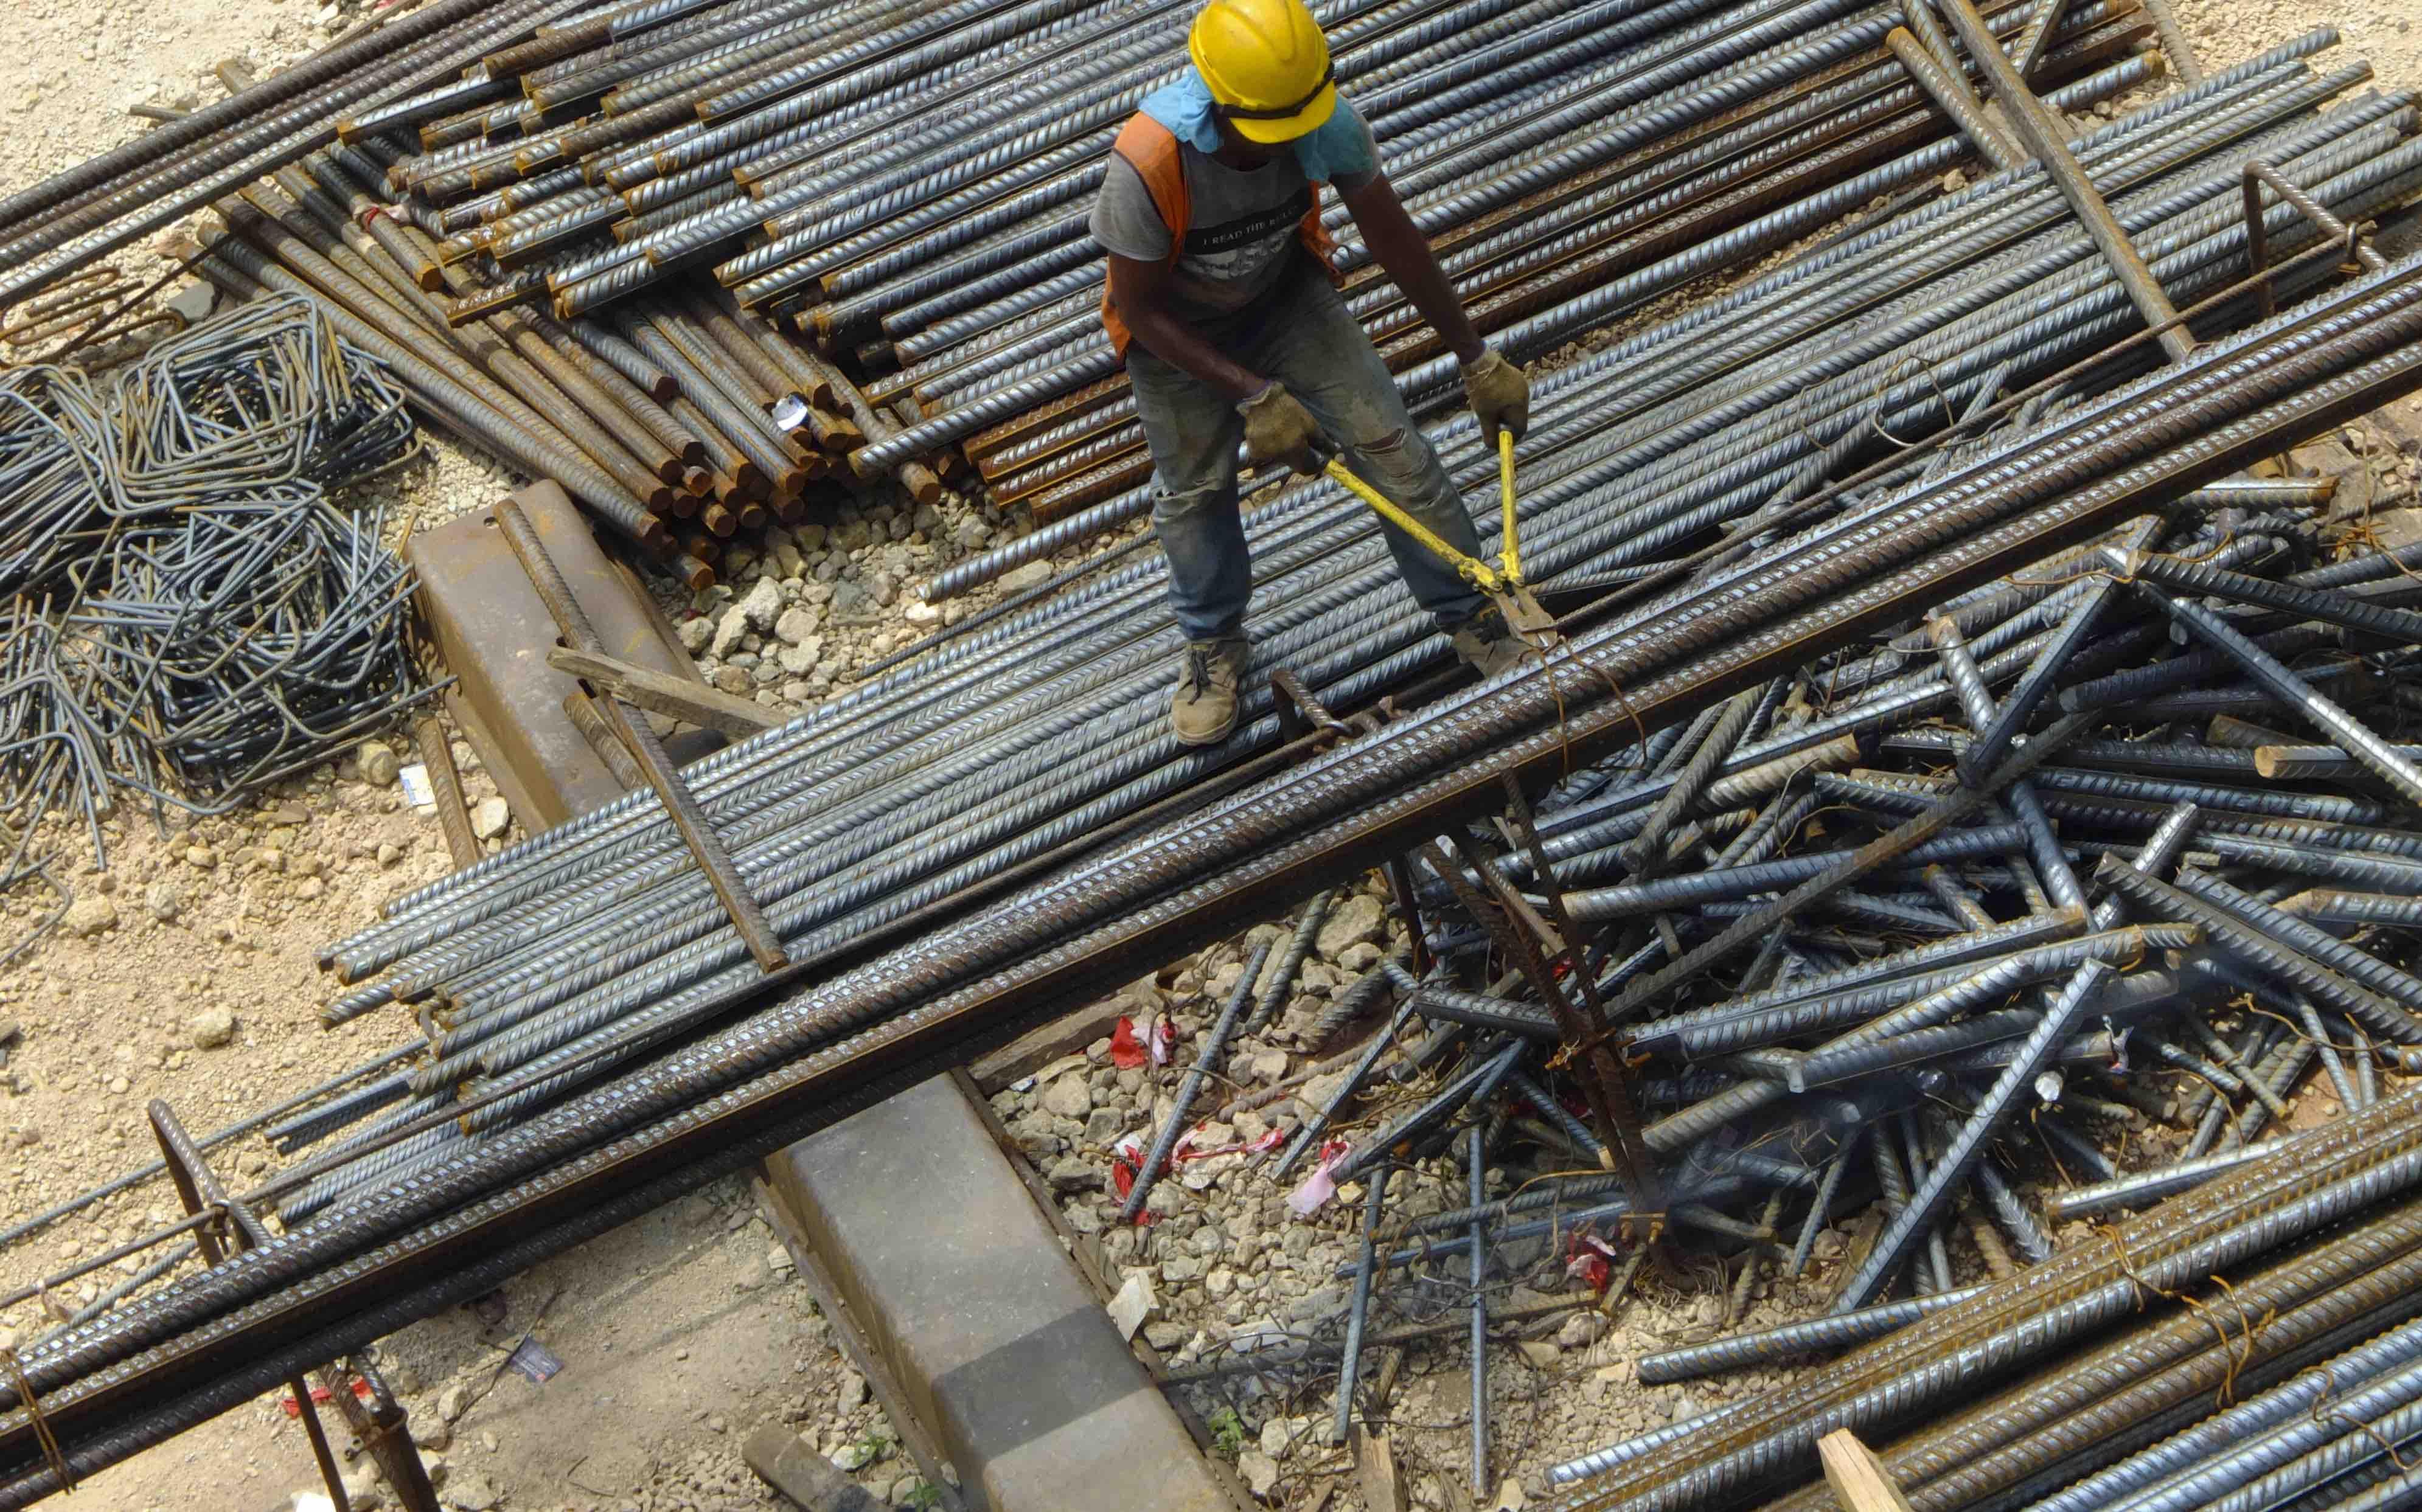 Construction in Kuala Lumpur, Malaysia (Photo: Faris Hadziq via Getty)